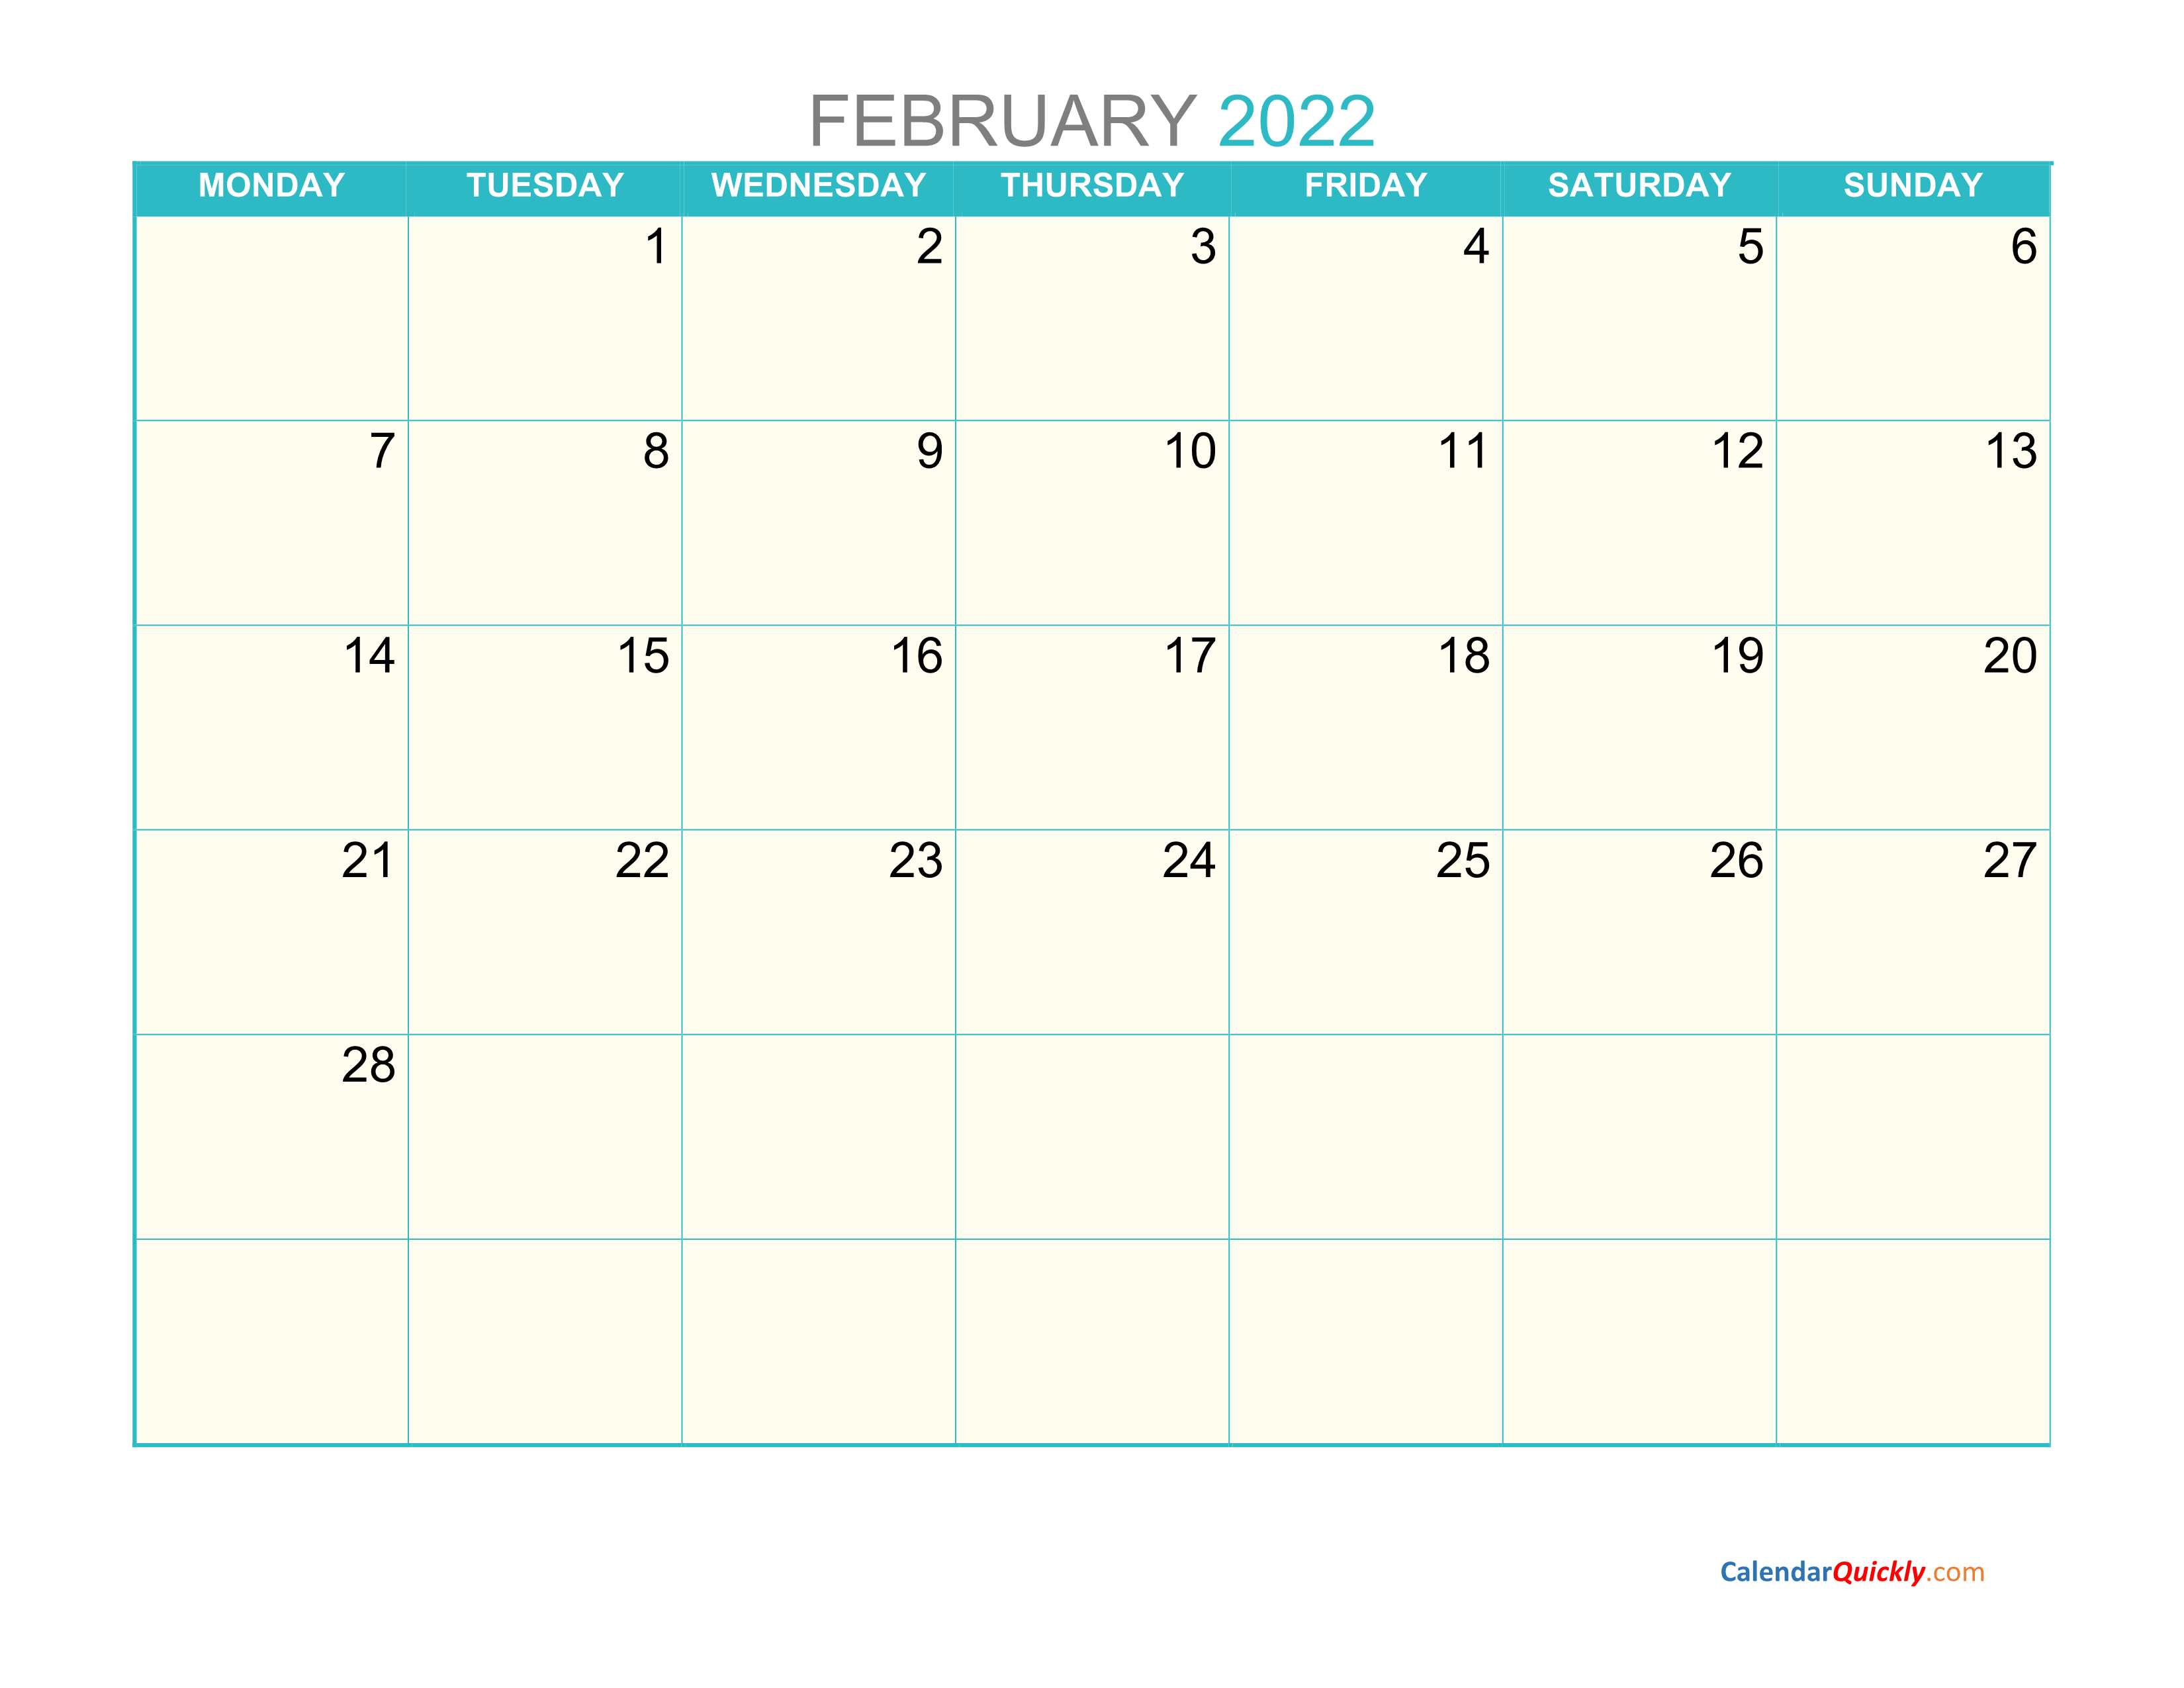 February Monday 2022 Calendar Printable | Calendar Quickly